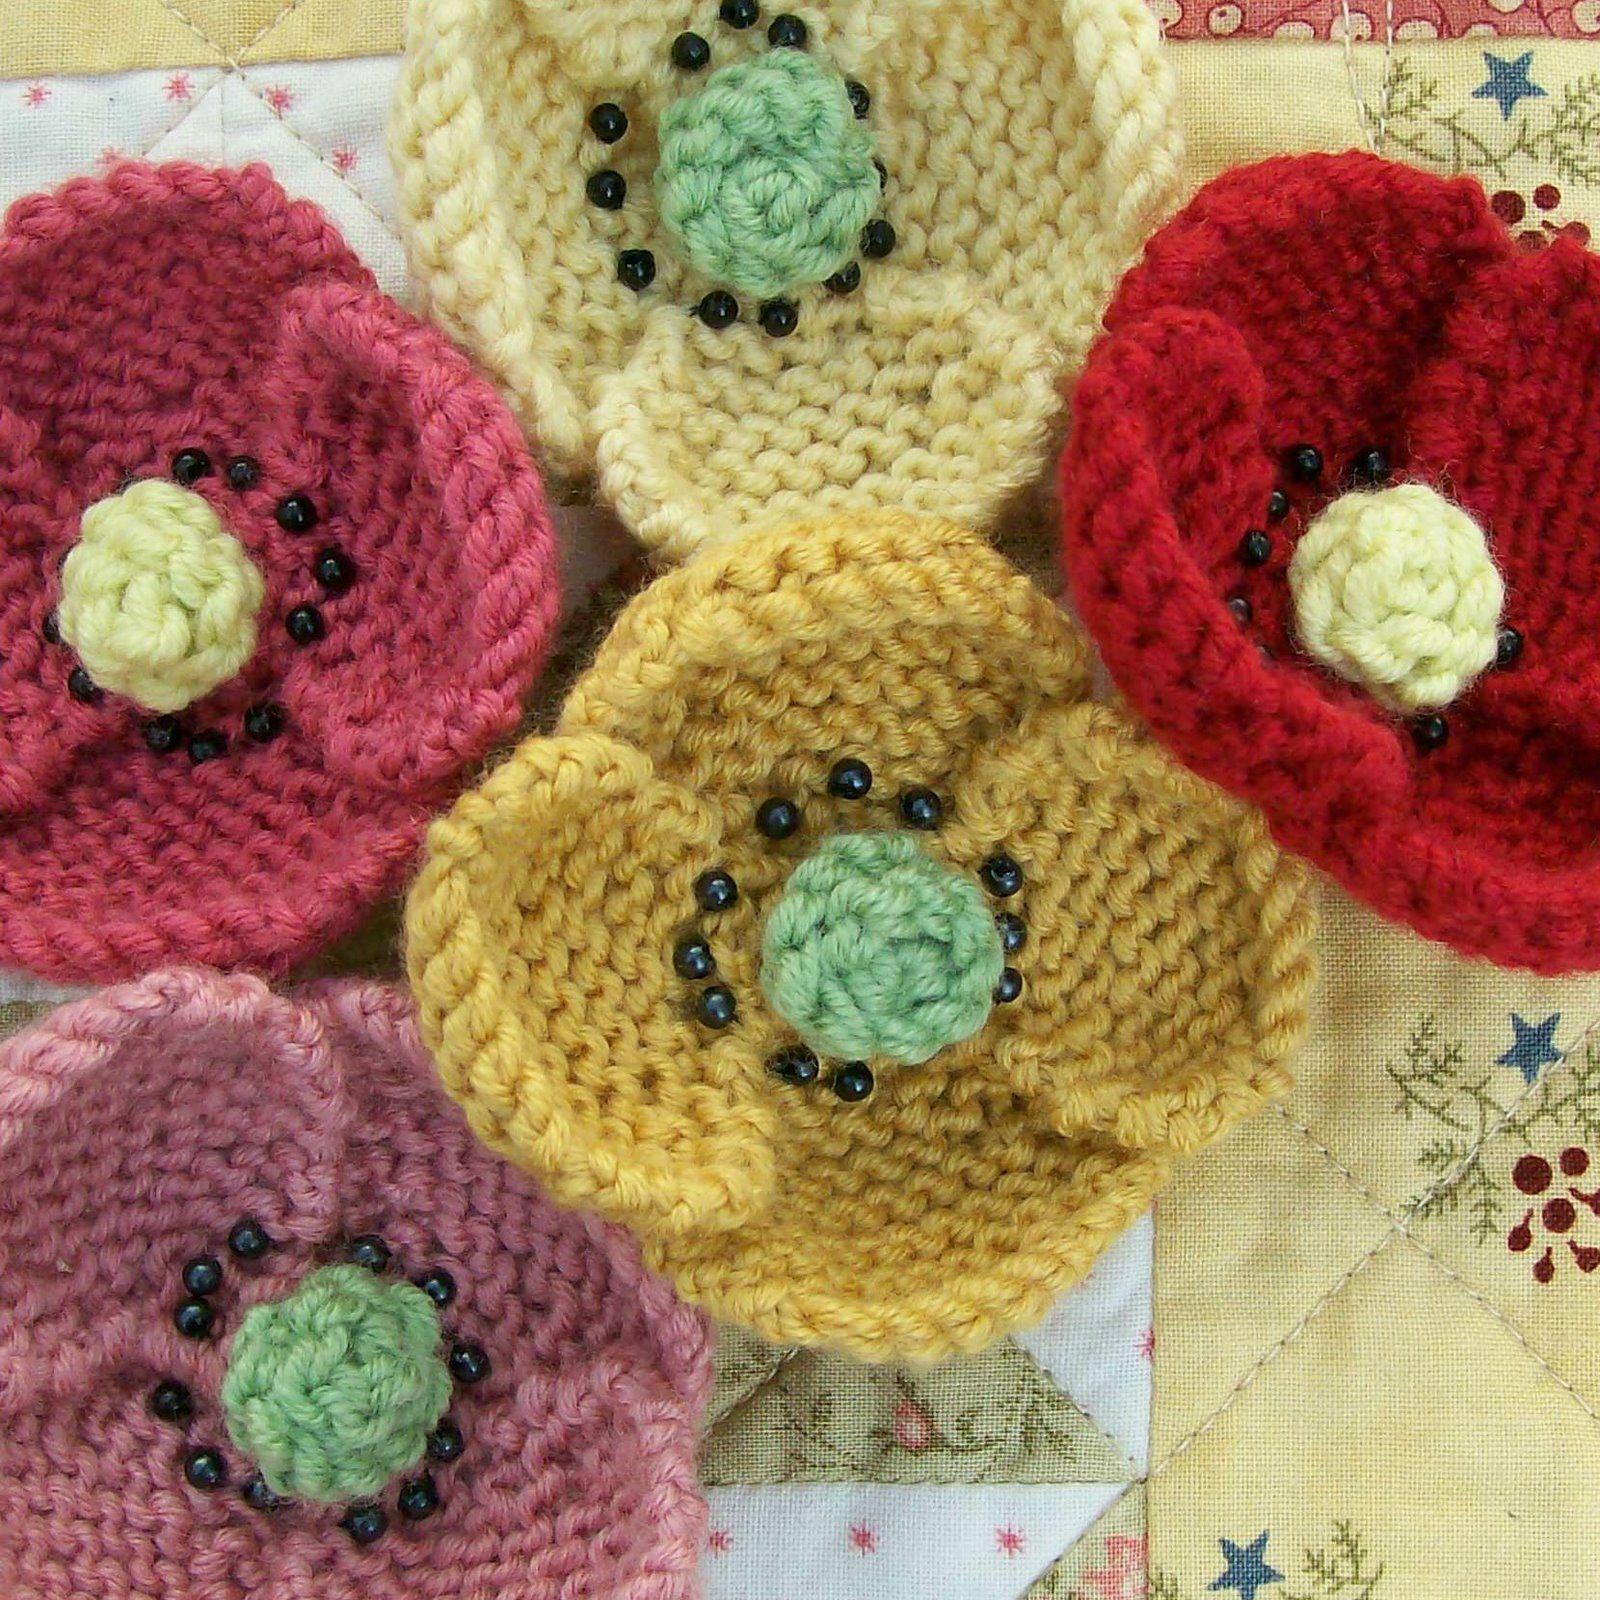 Knot garden crochet flowers pinterest knots gardens and crochet free pattern knot garden knitted poppiesknit flowerscrocheted bankloansurffo Image collections